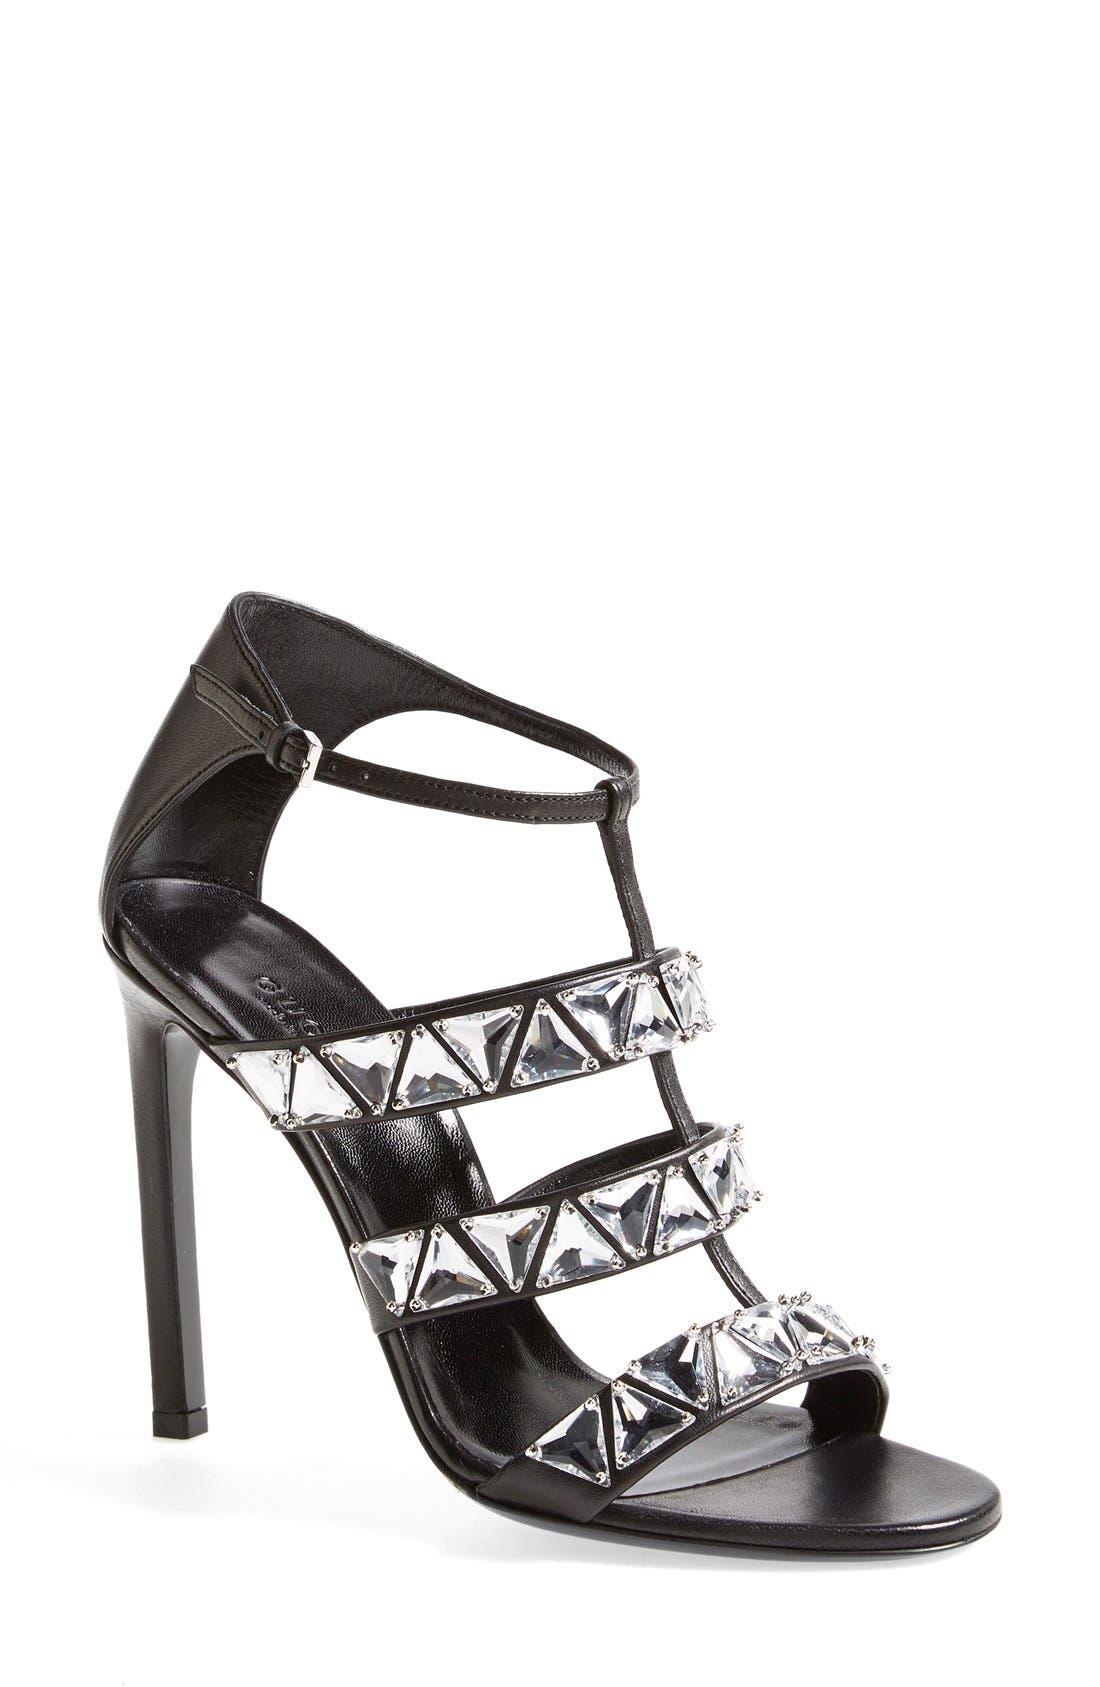 Main Image - Gucci 'Night Out' Sandal (Women)